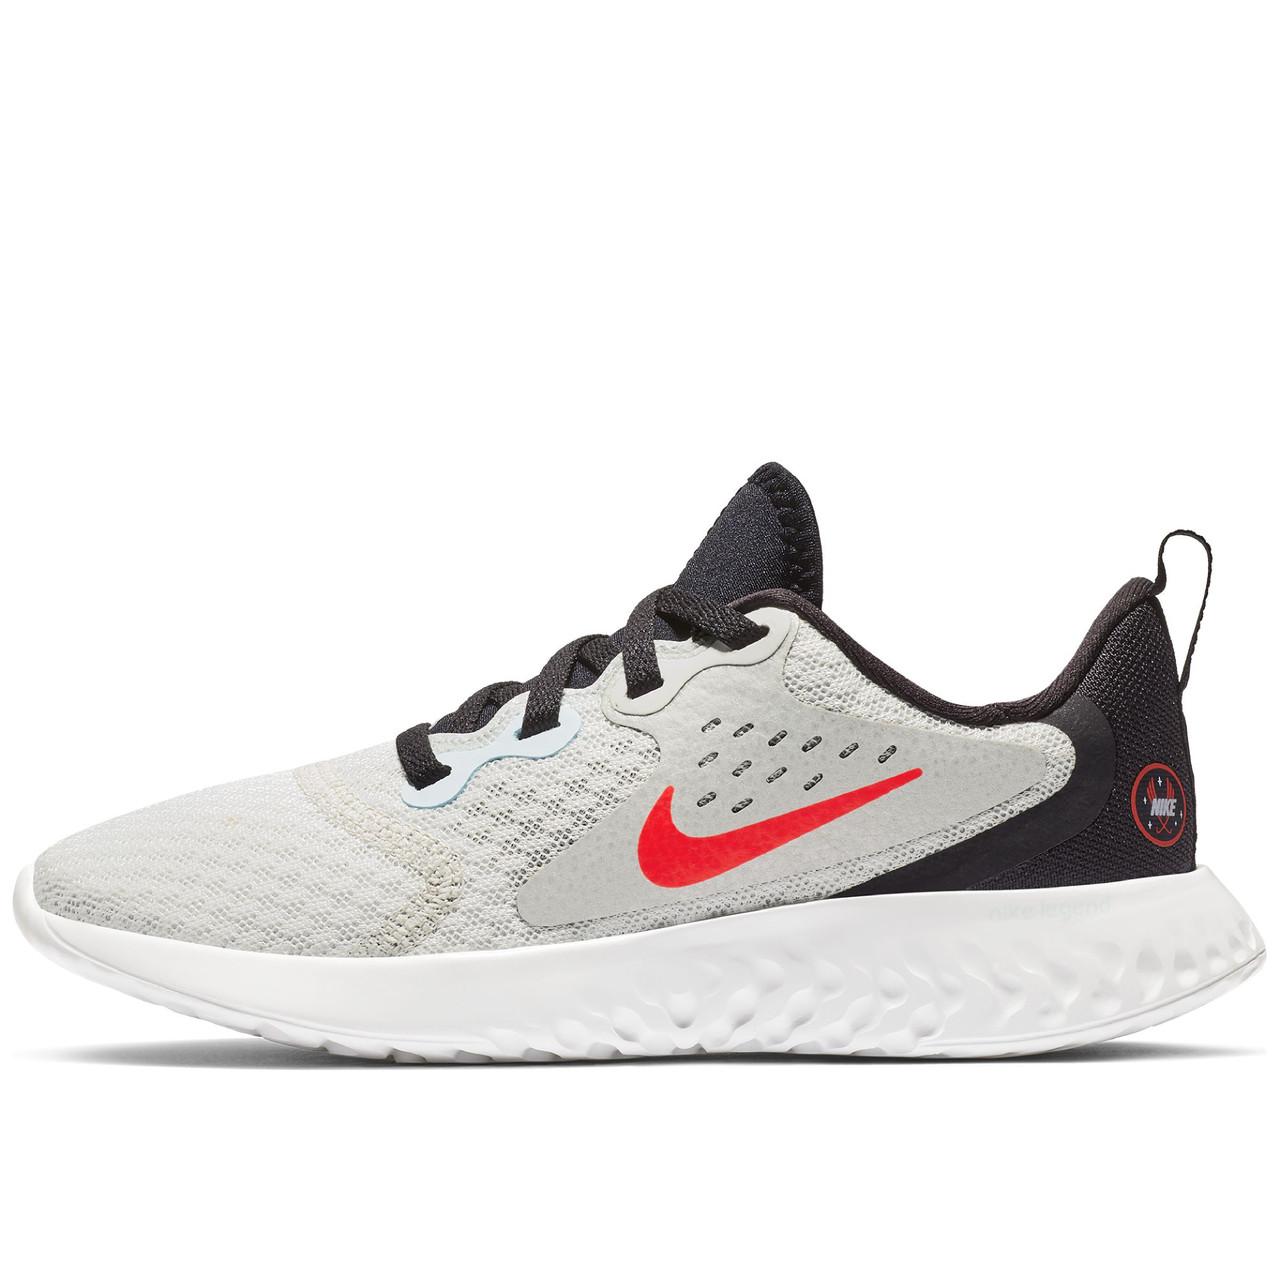 6d78f676 Детские Кроссовки Nike Legend SD Little Shoe BQ8841-001 (Оригинал ...